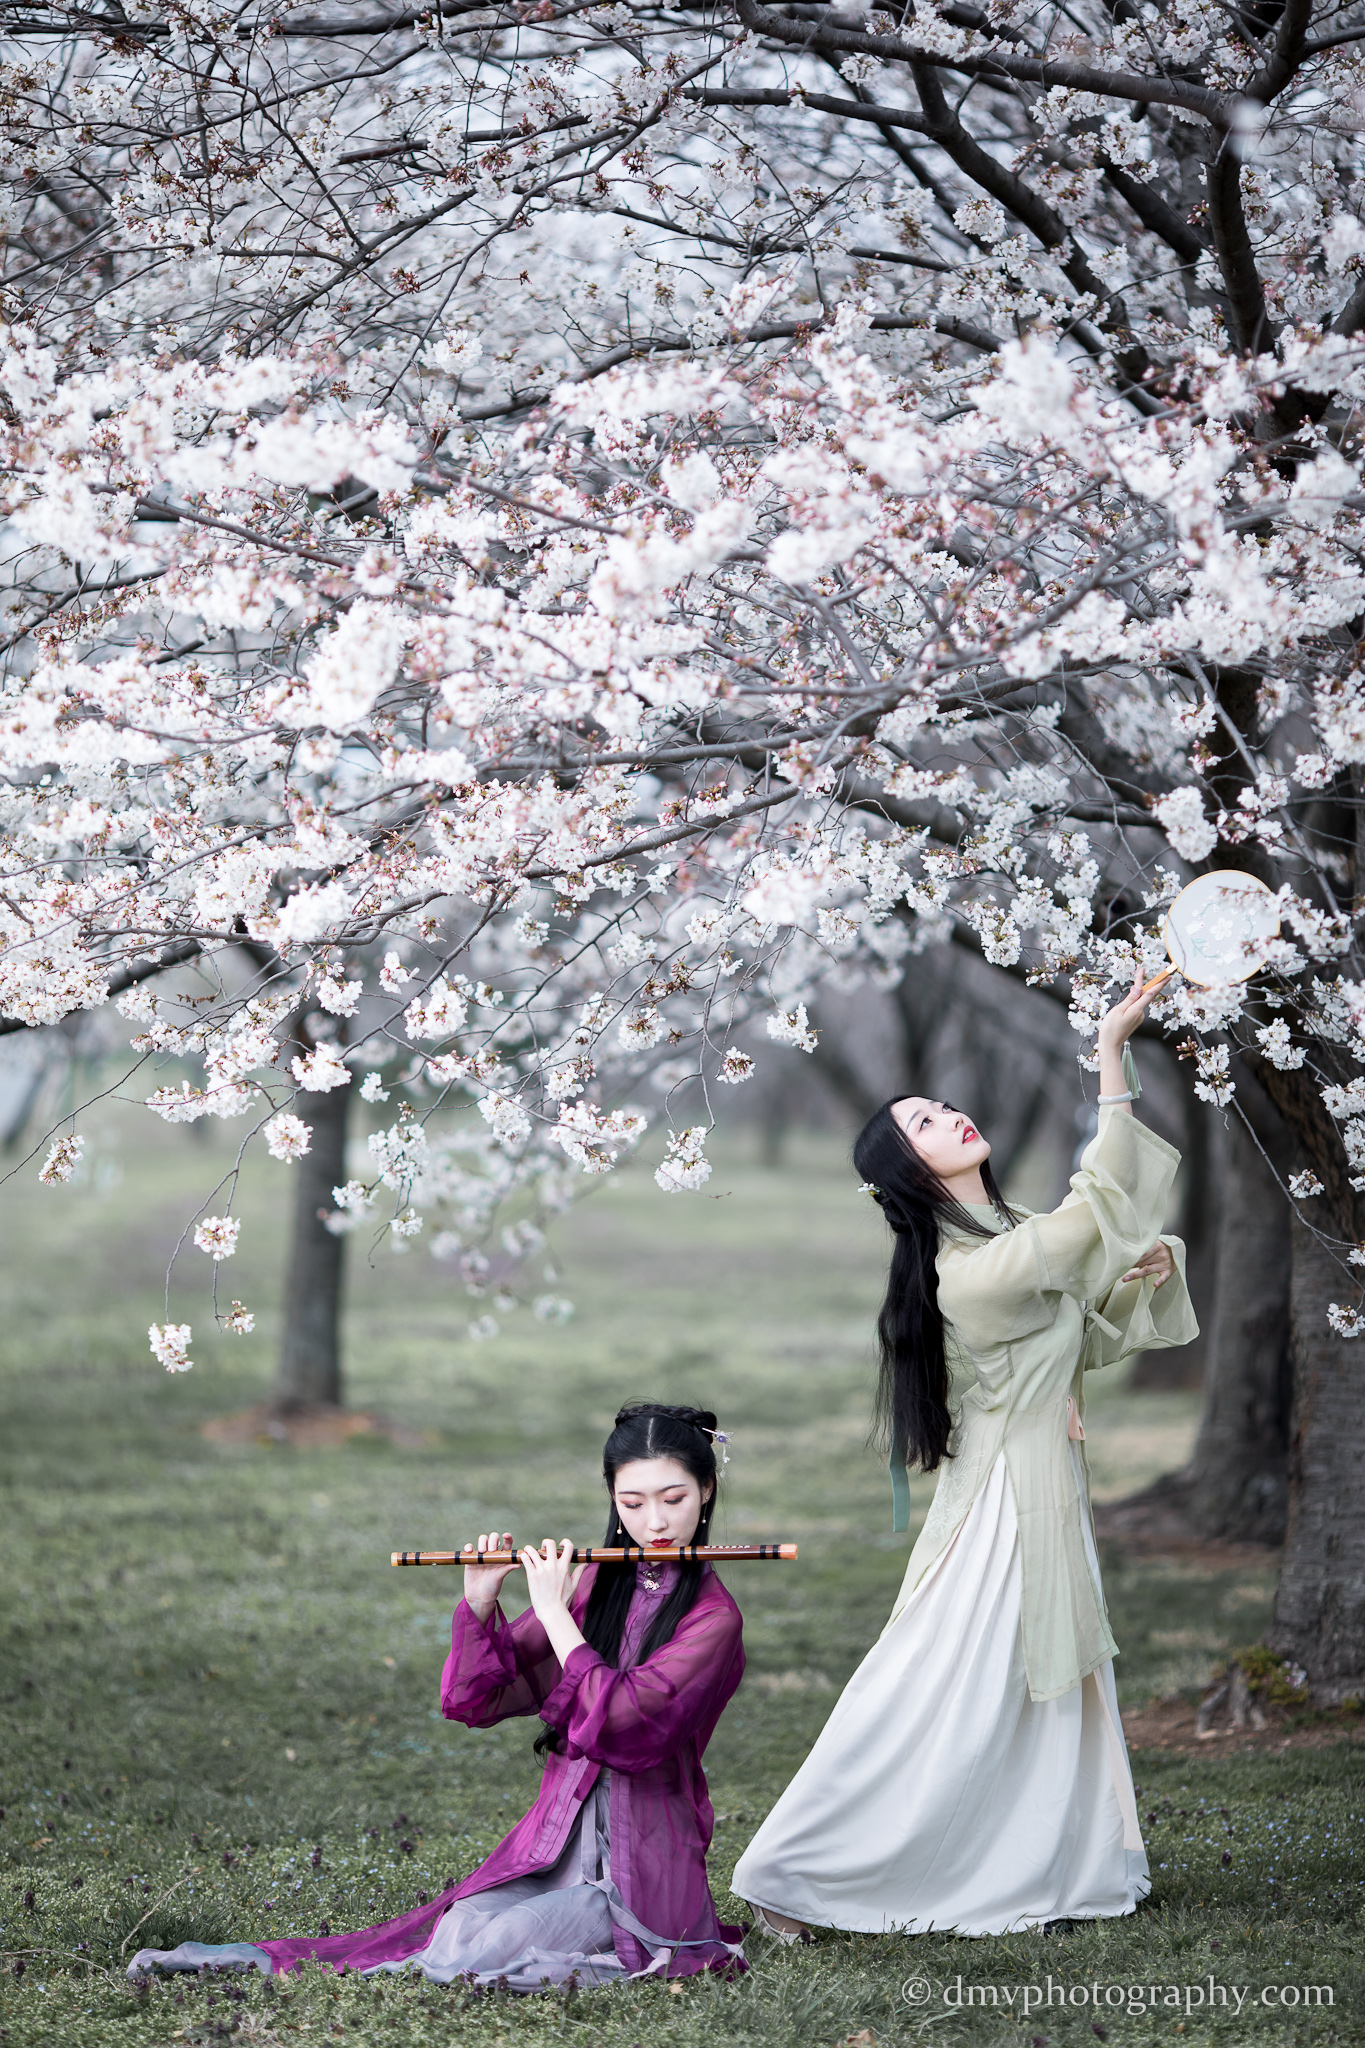 2017-03-25 - Day Cherry Blossom - 00030